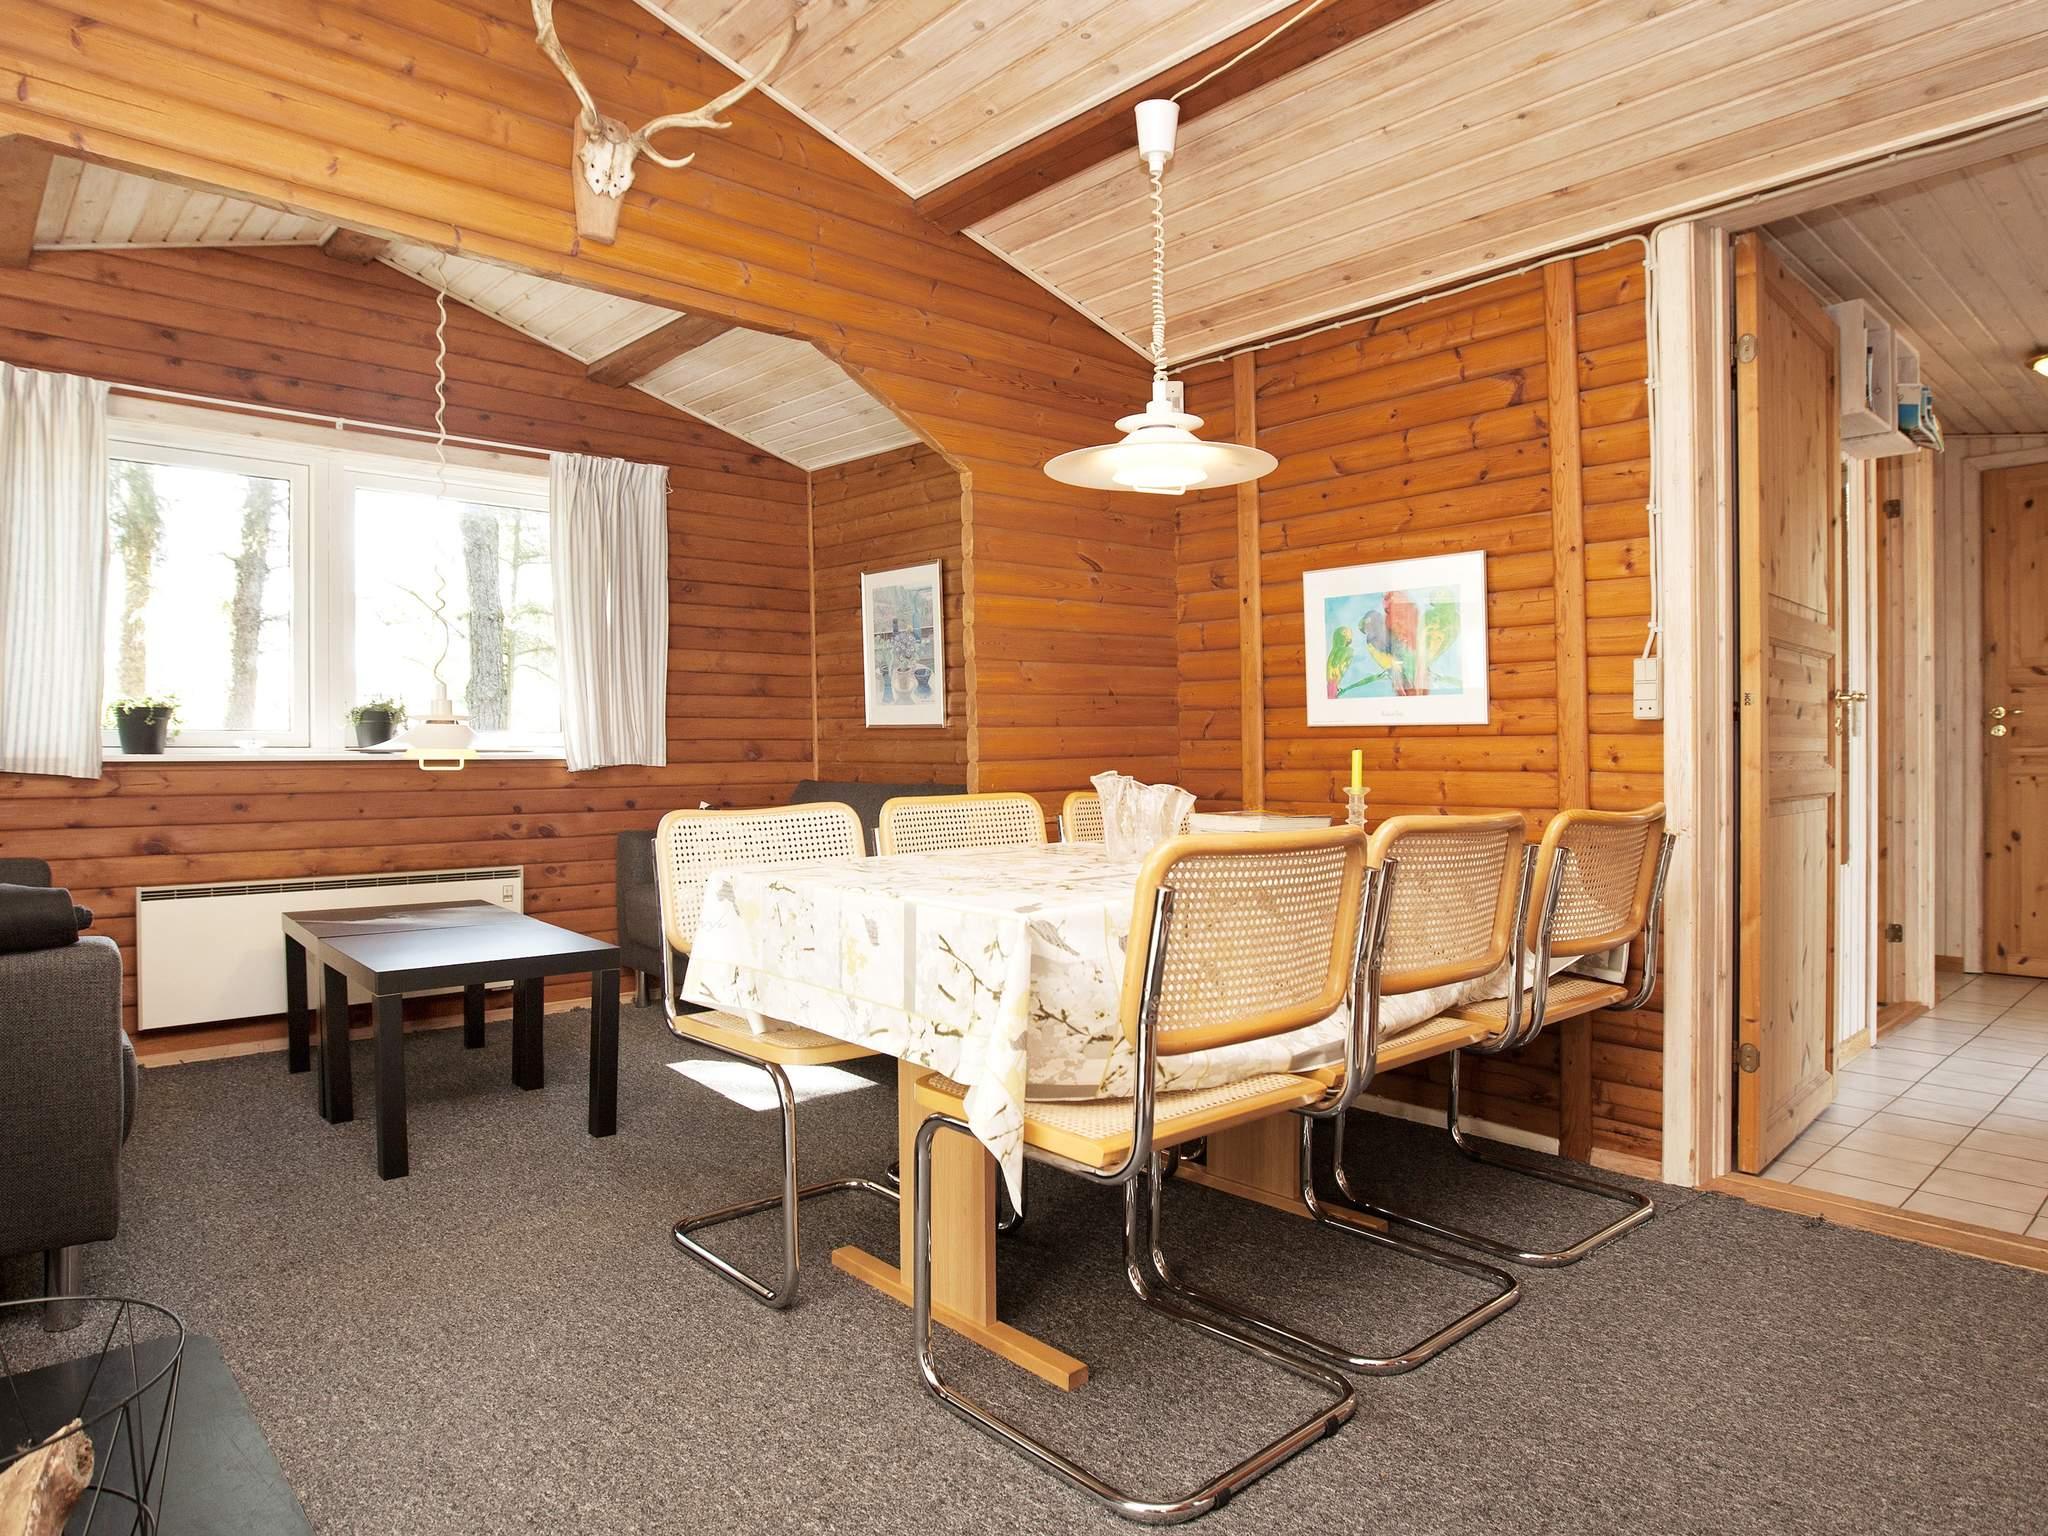 Maison de vacances Kramnitze (87262), Kramnitse, , Lolland, Danemark, image 5